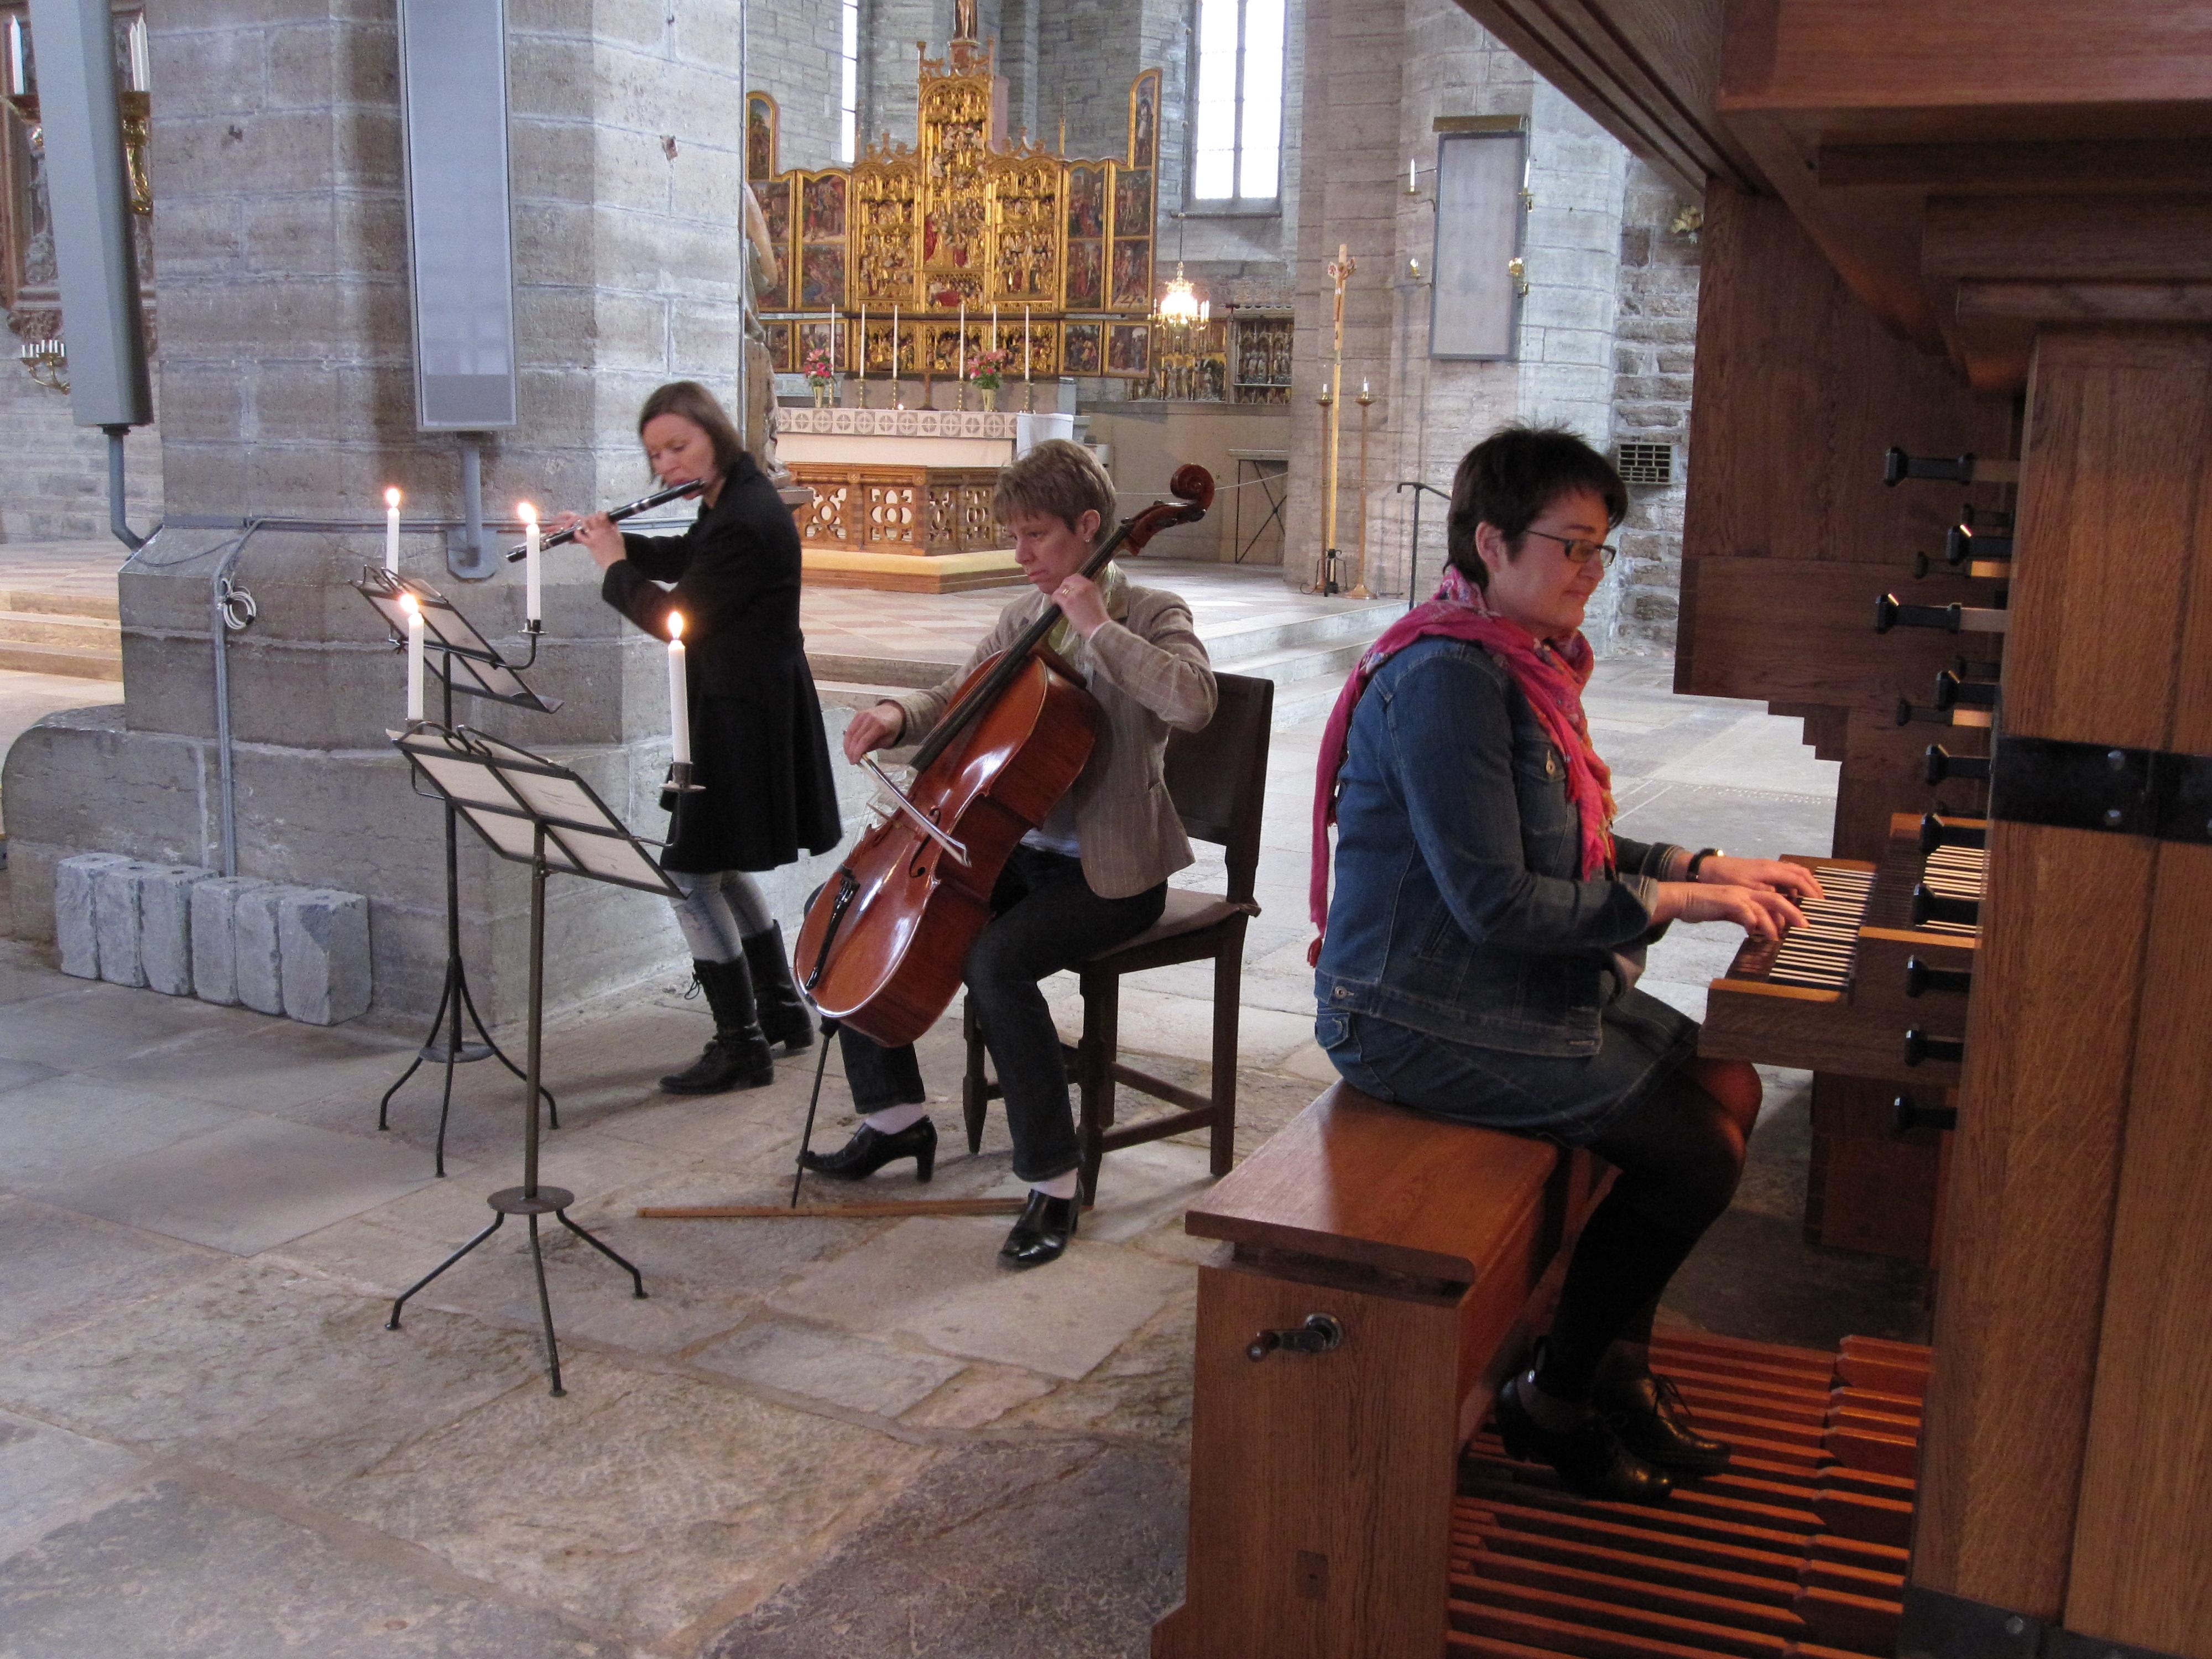 Kammarmusik Gemzell Musikommunikation